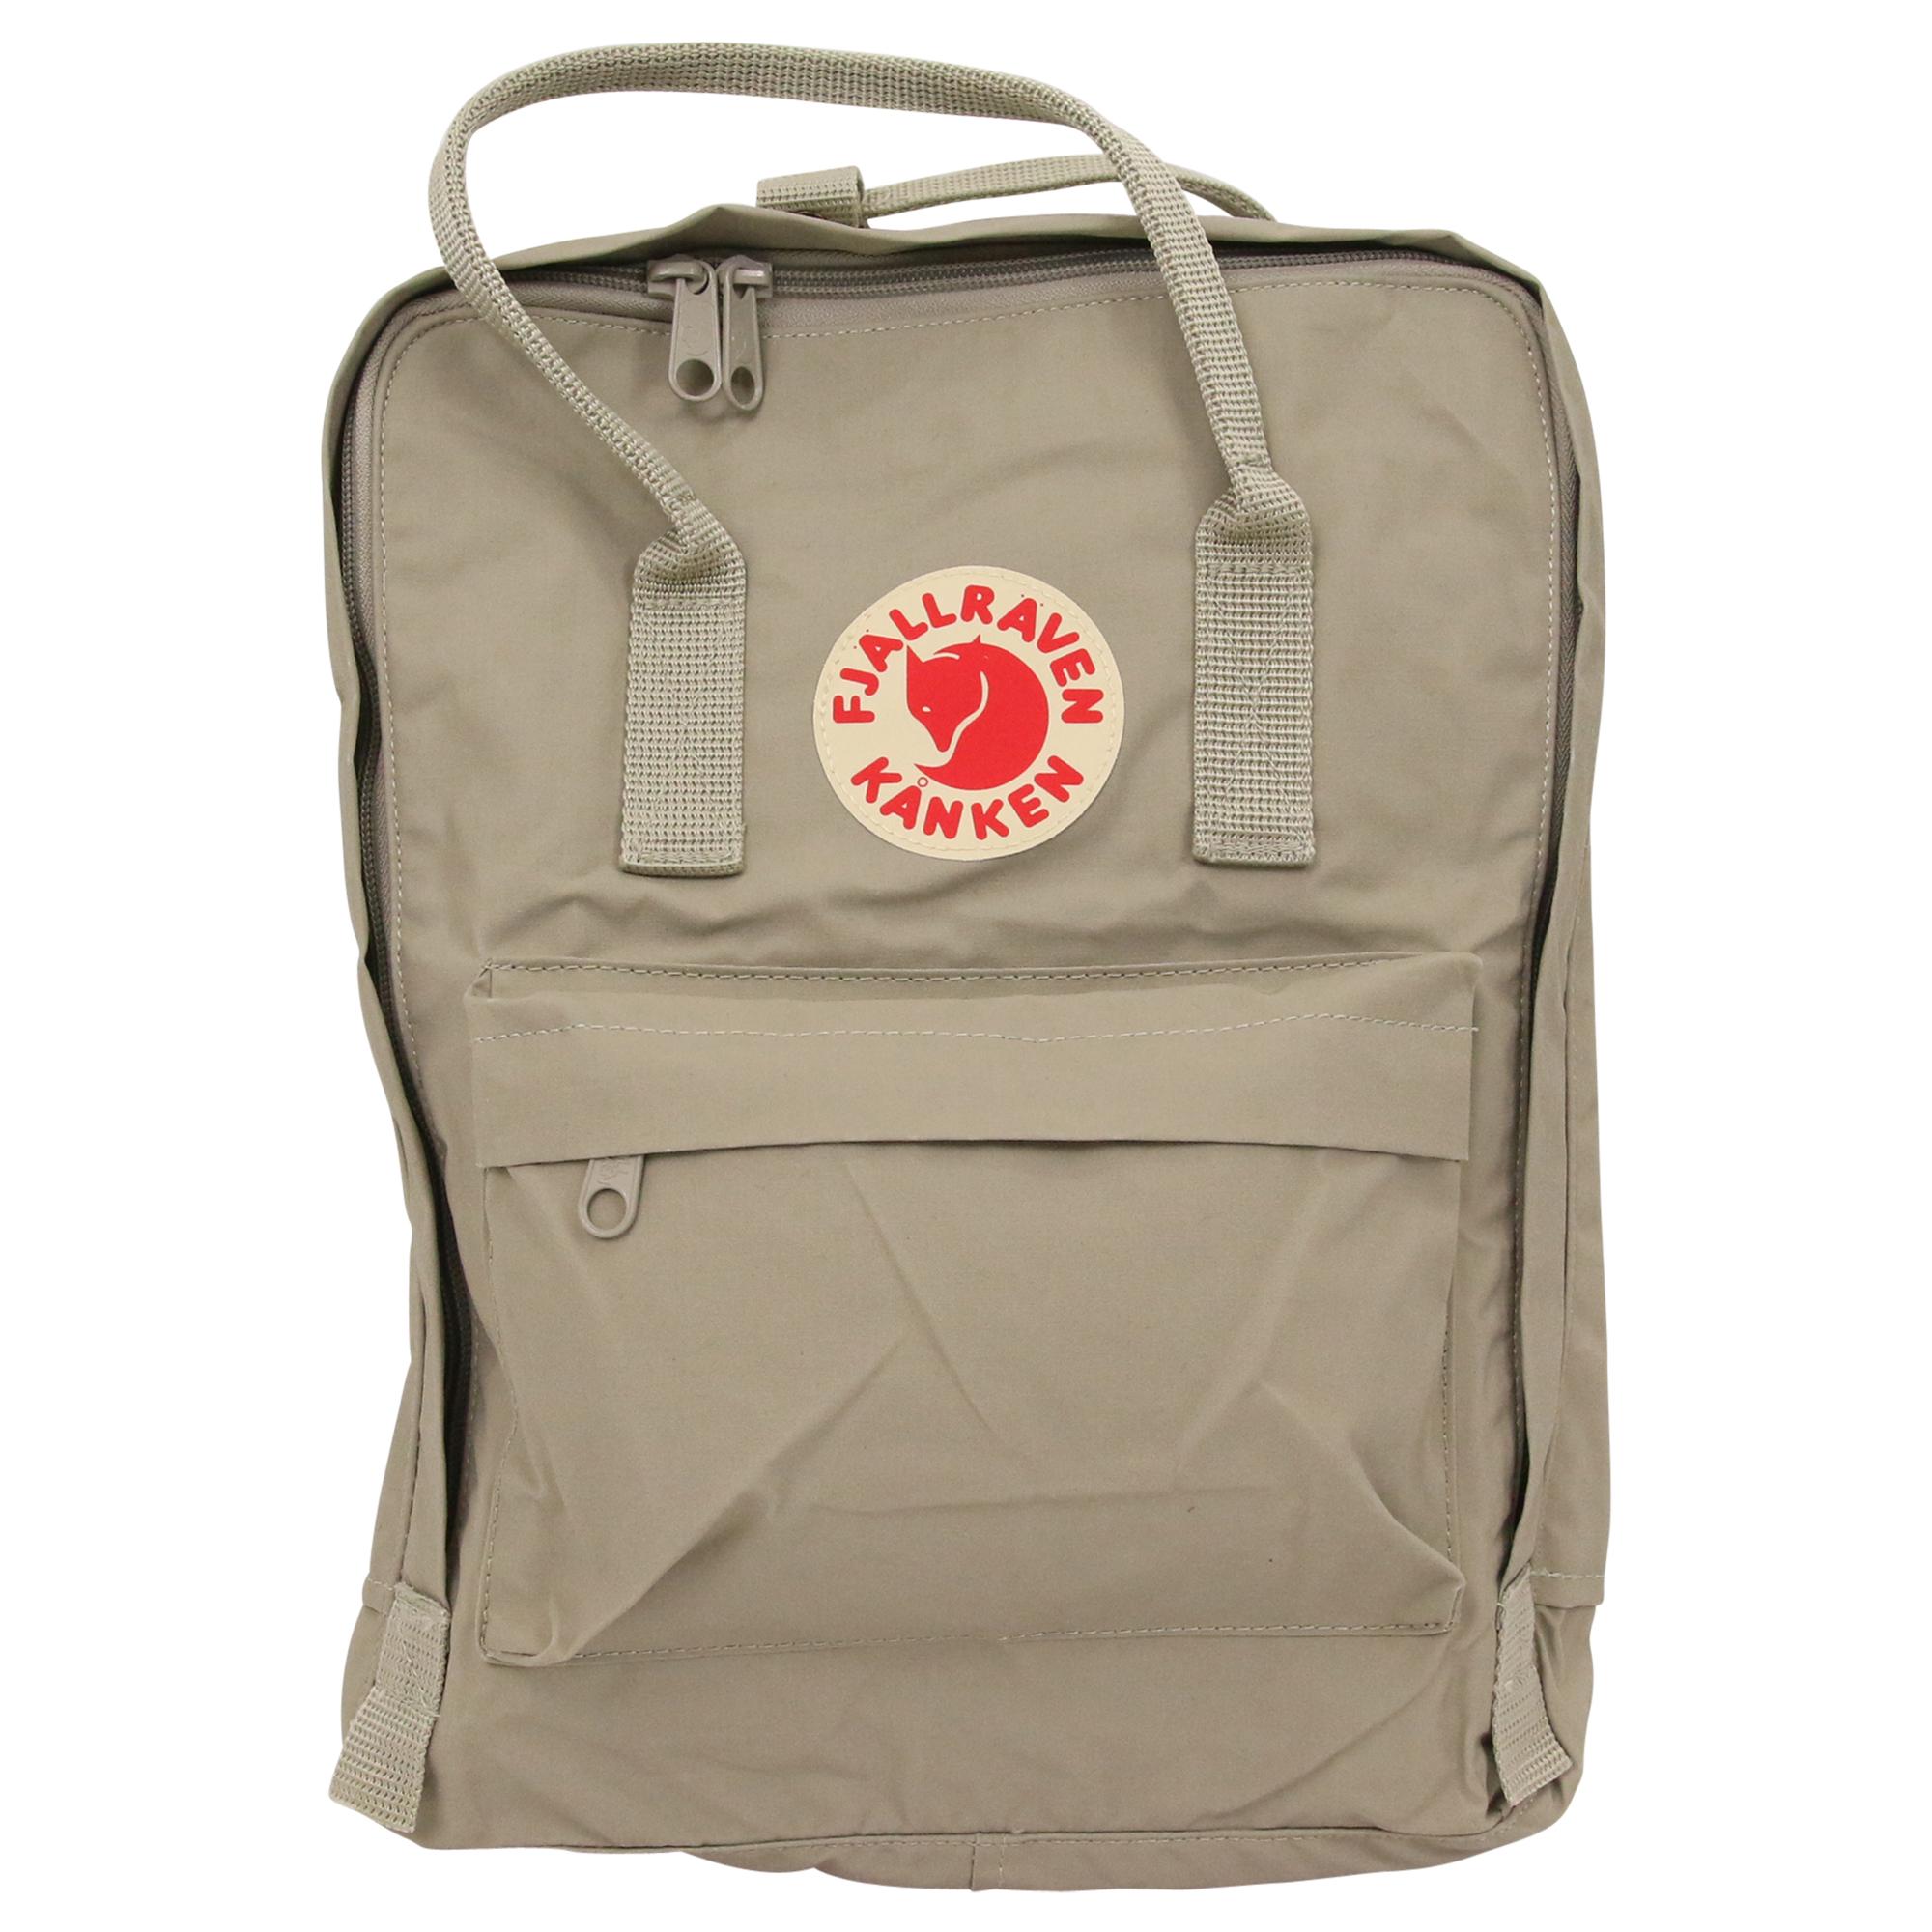 fjällräven rucksack kanken rucksack